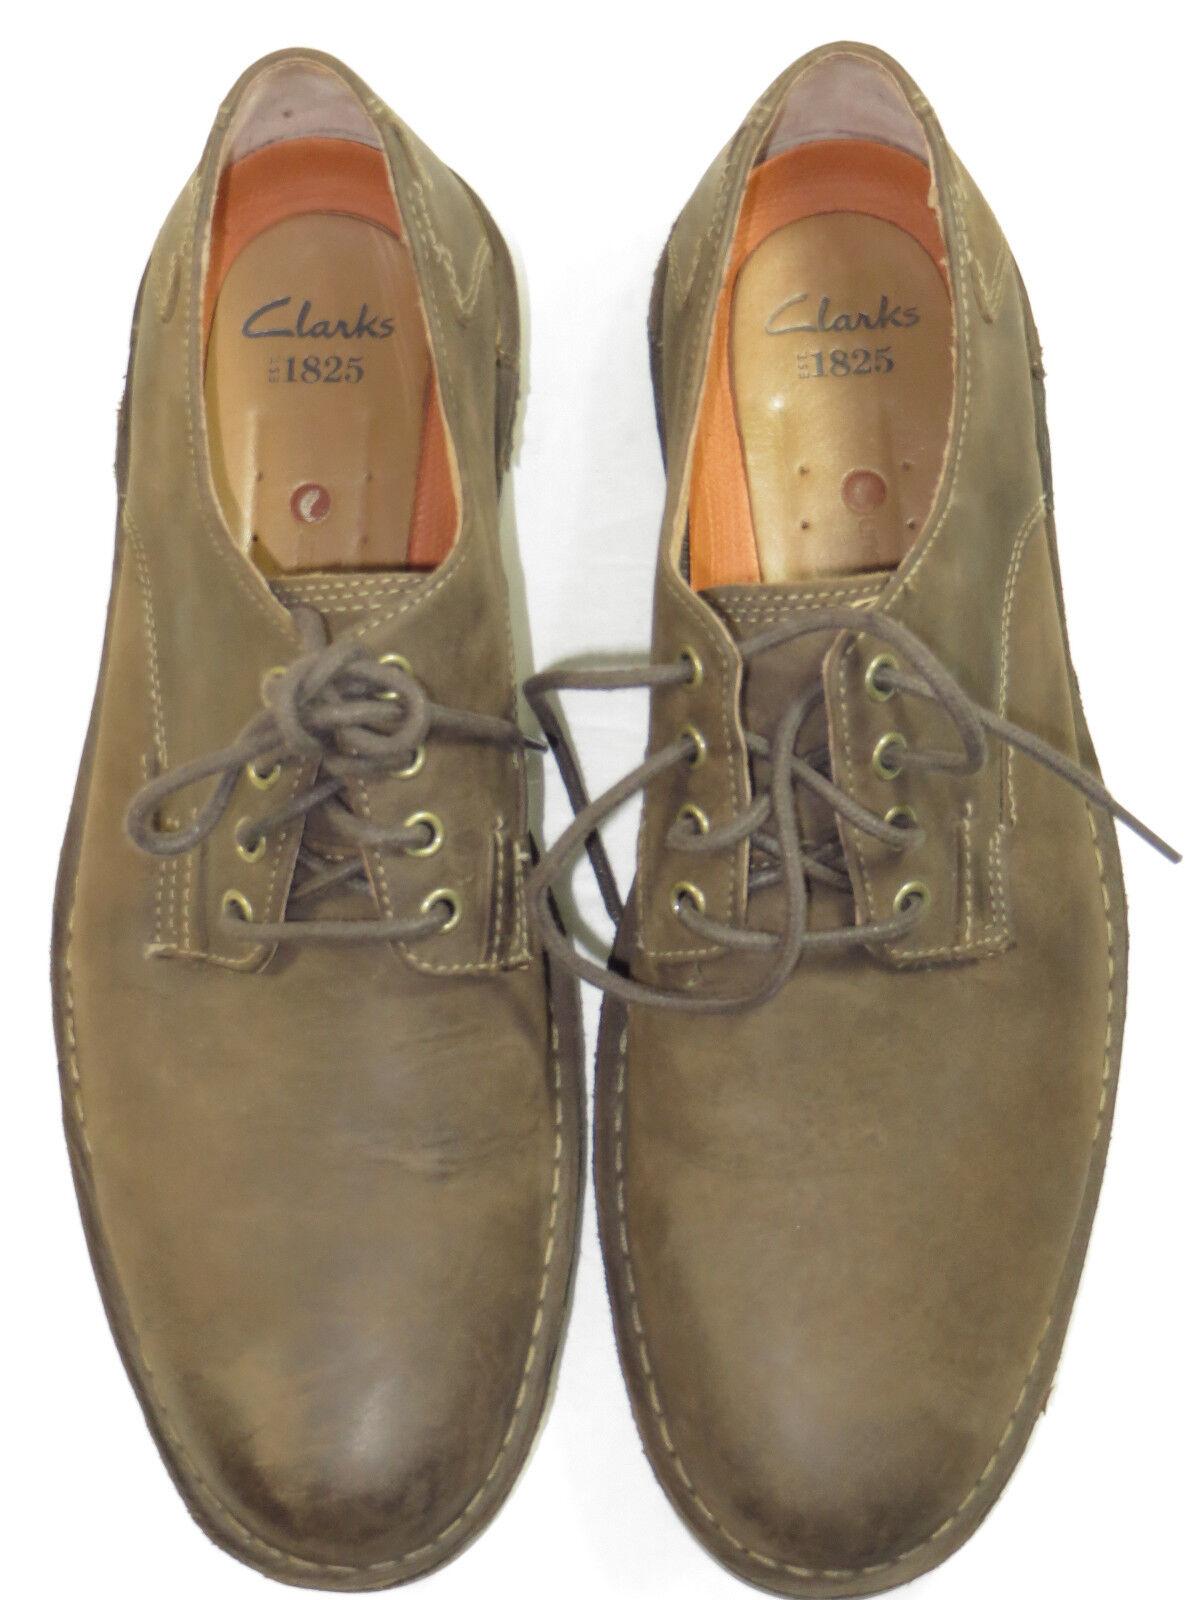 Rare beauty NWOB Men's Clarks LUGANO Oxfords Work walk shoes Size 12 M